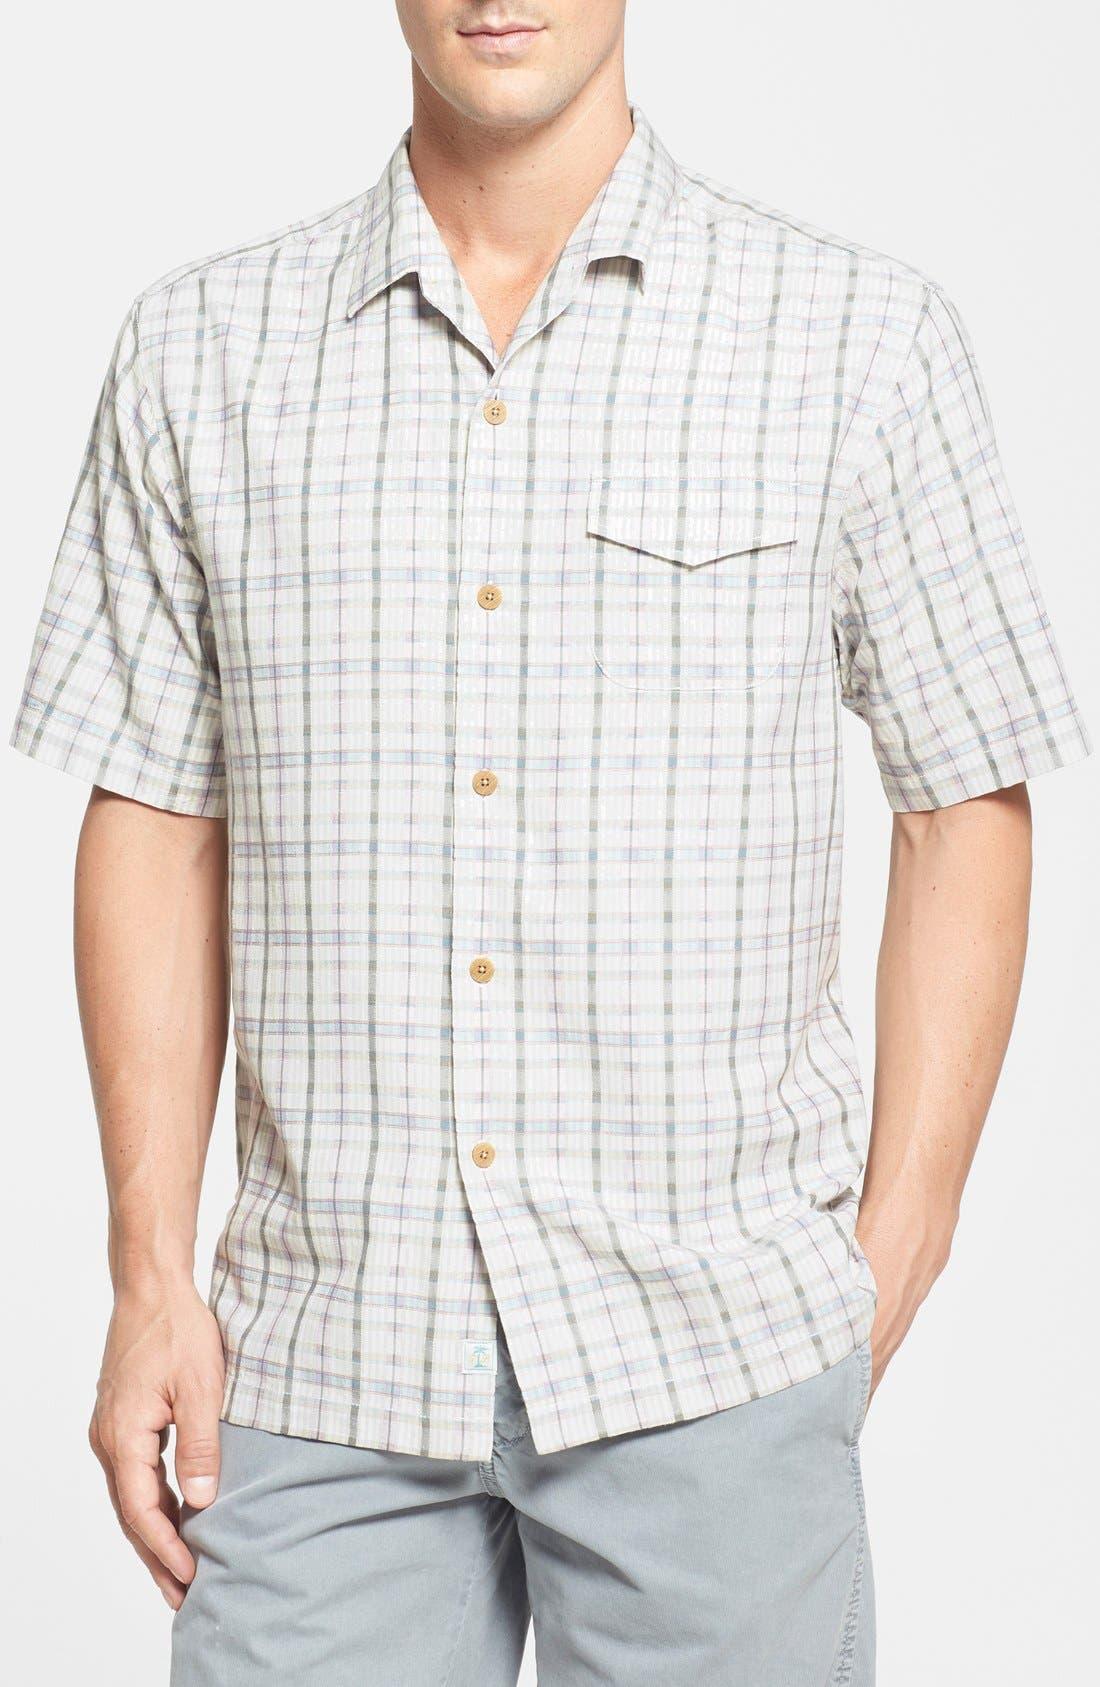 Main Image - Tommy Bahama 'Jammin' Plaid' Original Fit Plaid Silk Campshirt